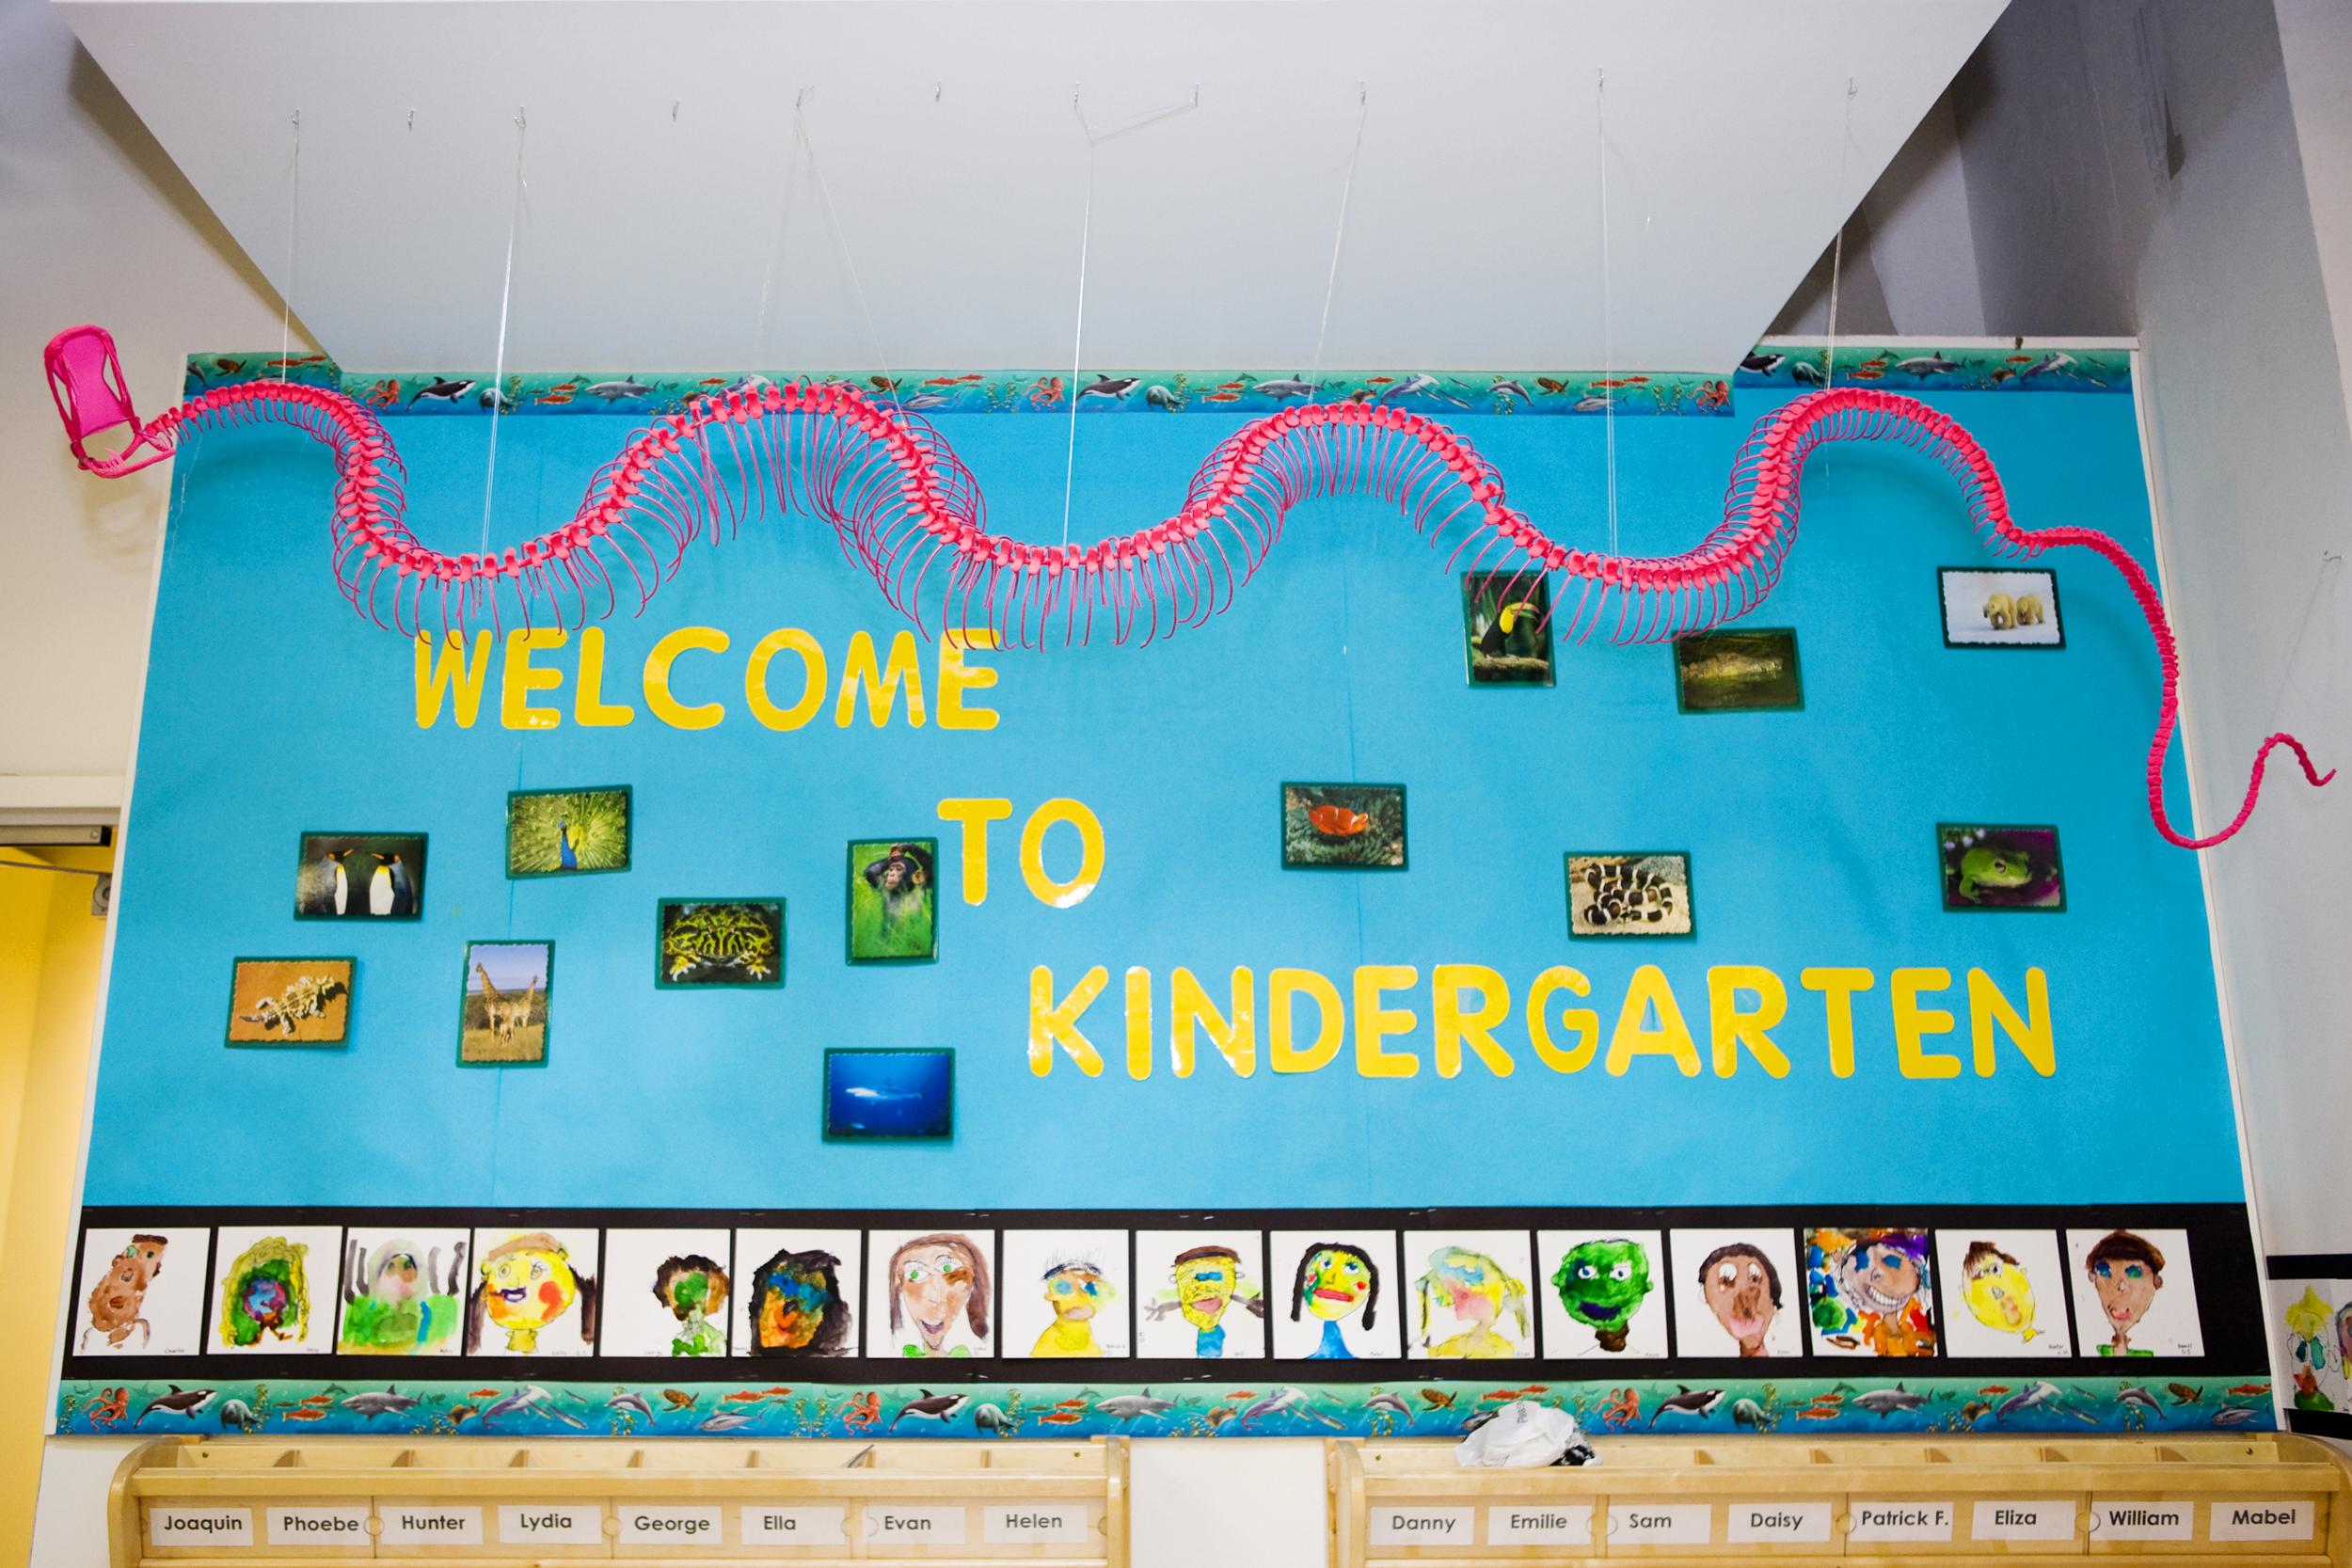 ceci_new_york_event_invitation_the_mandell_school_new_york_city_opening_creative_elementary_kindergarden_middle_school_nyc-5.jpg